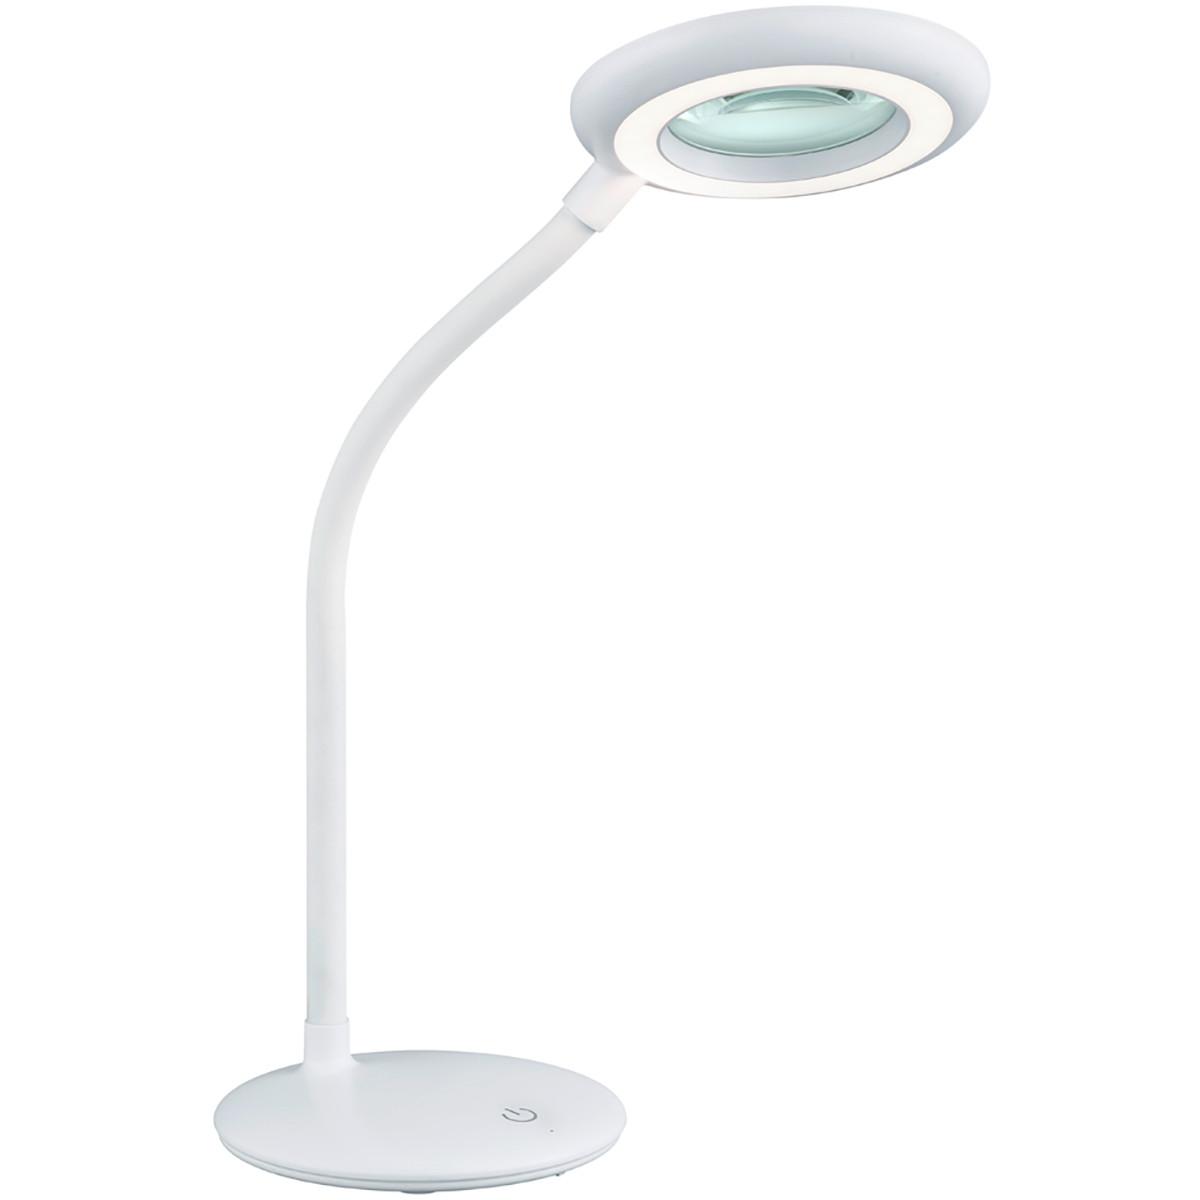 LED Tafellamp - Trion Dorano - Dimbaar - Vergrootglas - USB Oplaadbaar - Flexibe